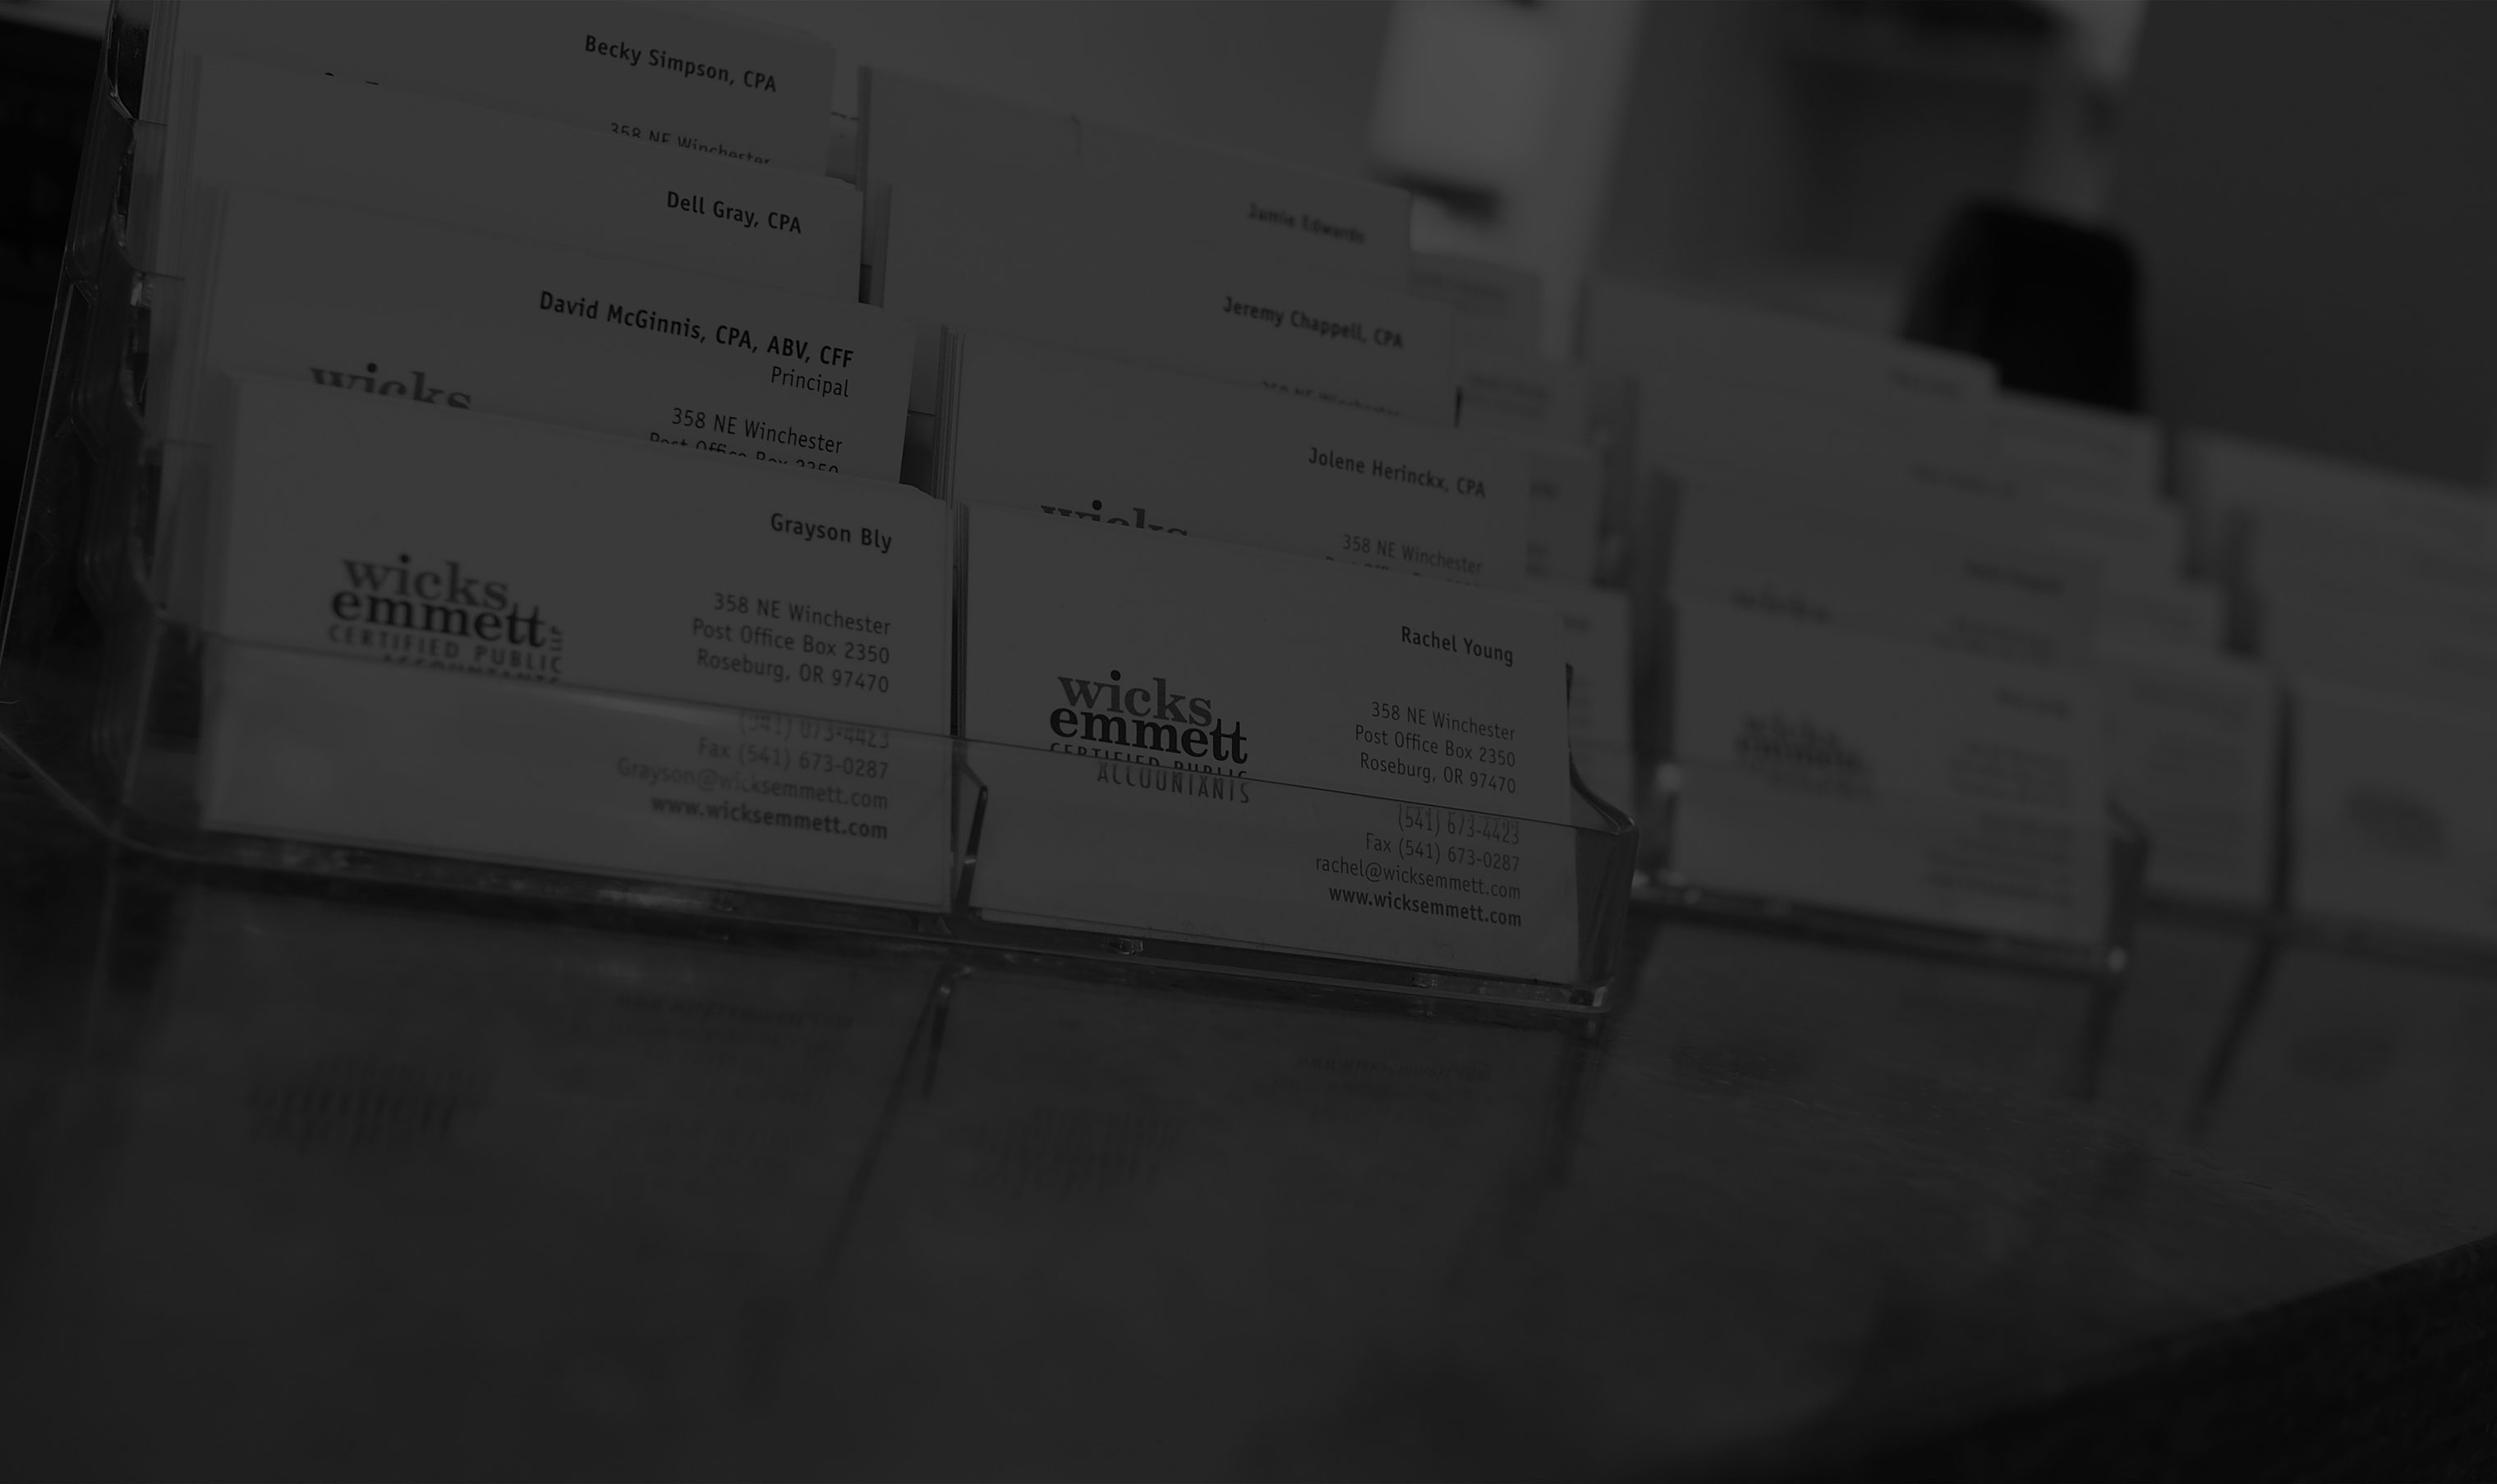 wicks-emmett-business-cards-bkg-dark | Wicks Emmett CPA Firm